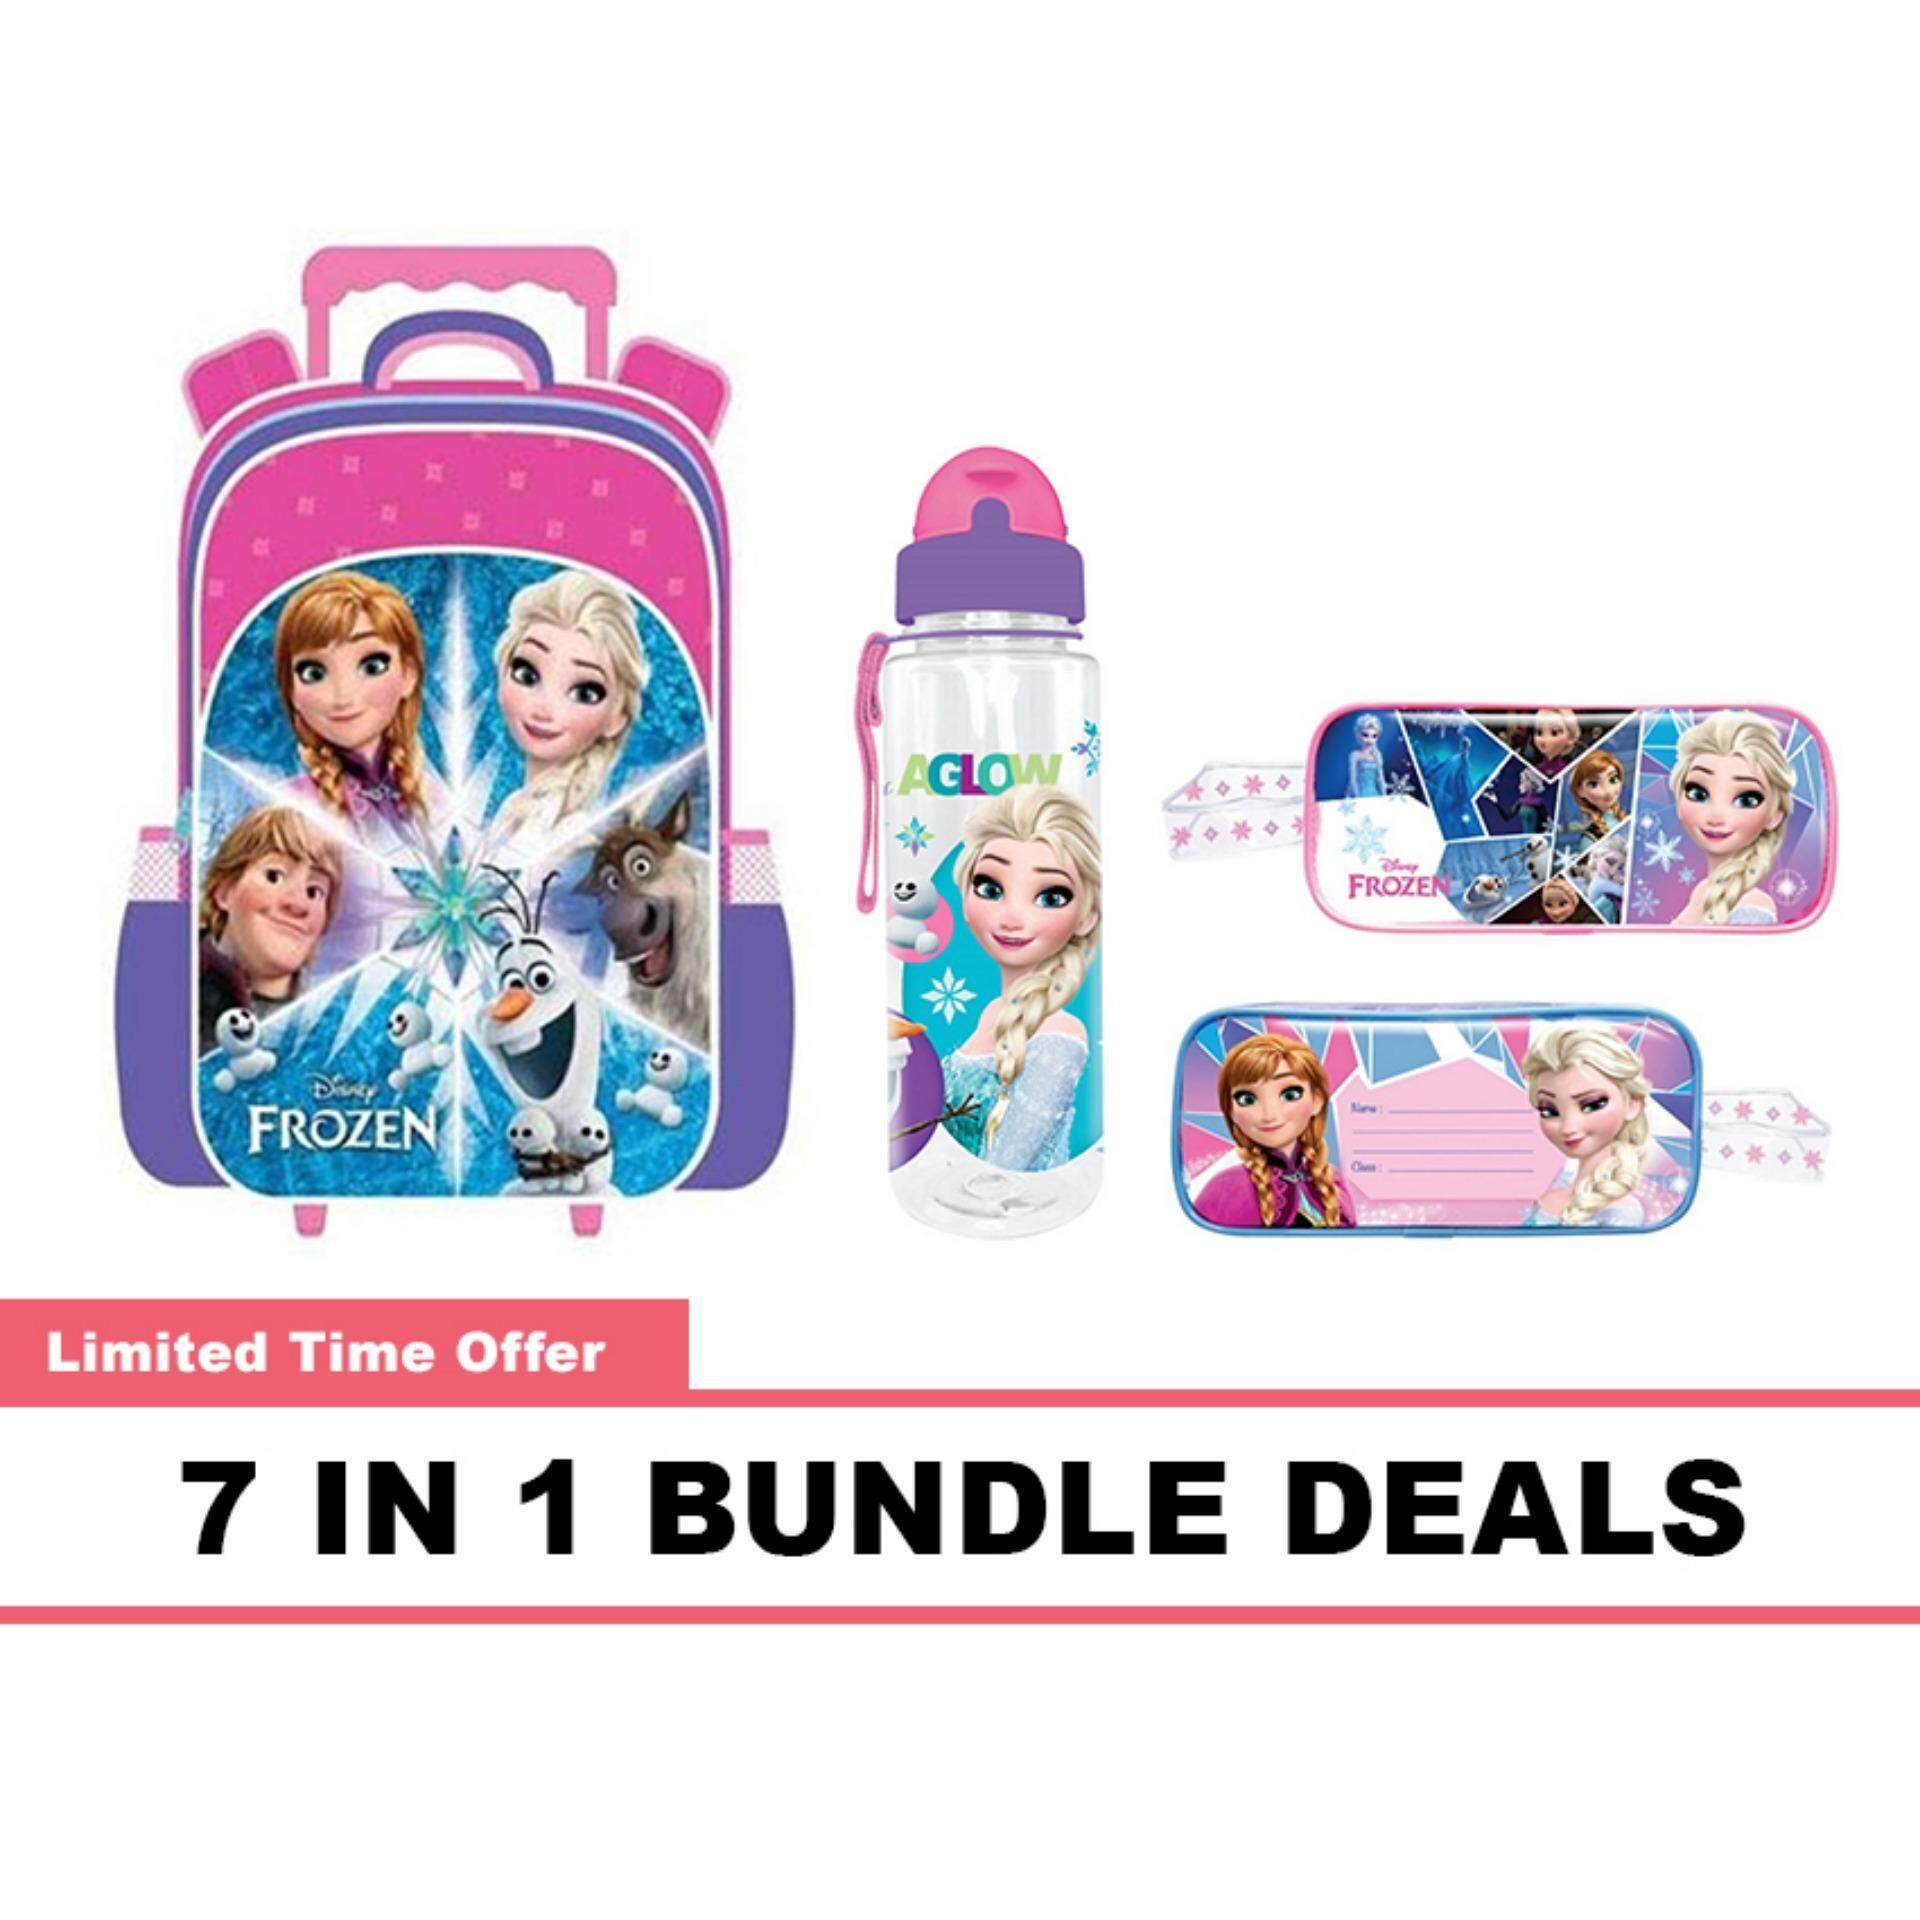 Disney Princess Frozen Pre School Kindergarten Nursery Kids Children School Trolley Bag 650ML BPA Free Water Bottle With Straw Square Pencil Bag Pencil Eraser Ruler & Sharpener 7 In 1 Bundle Deals